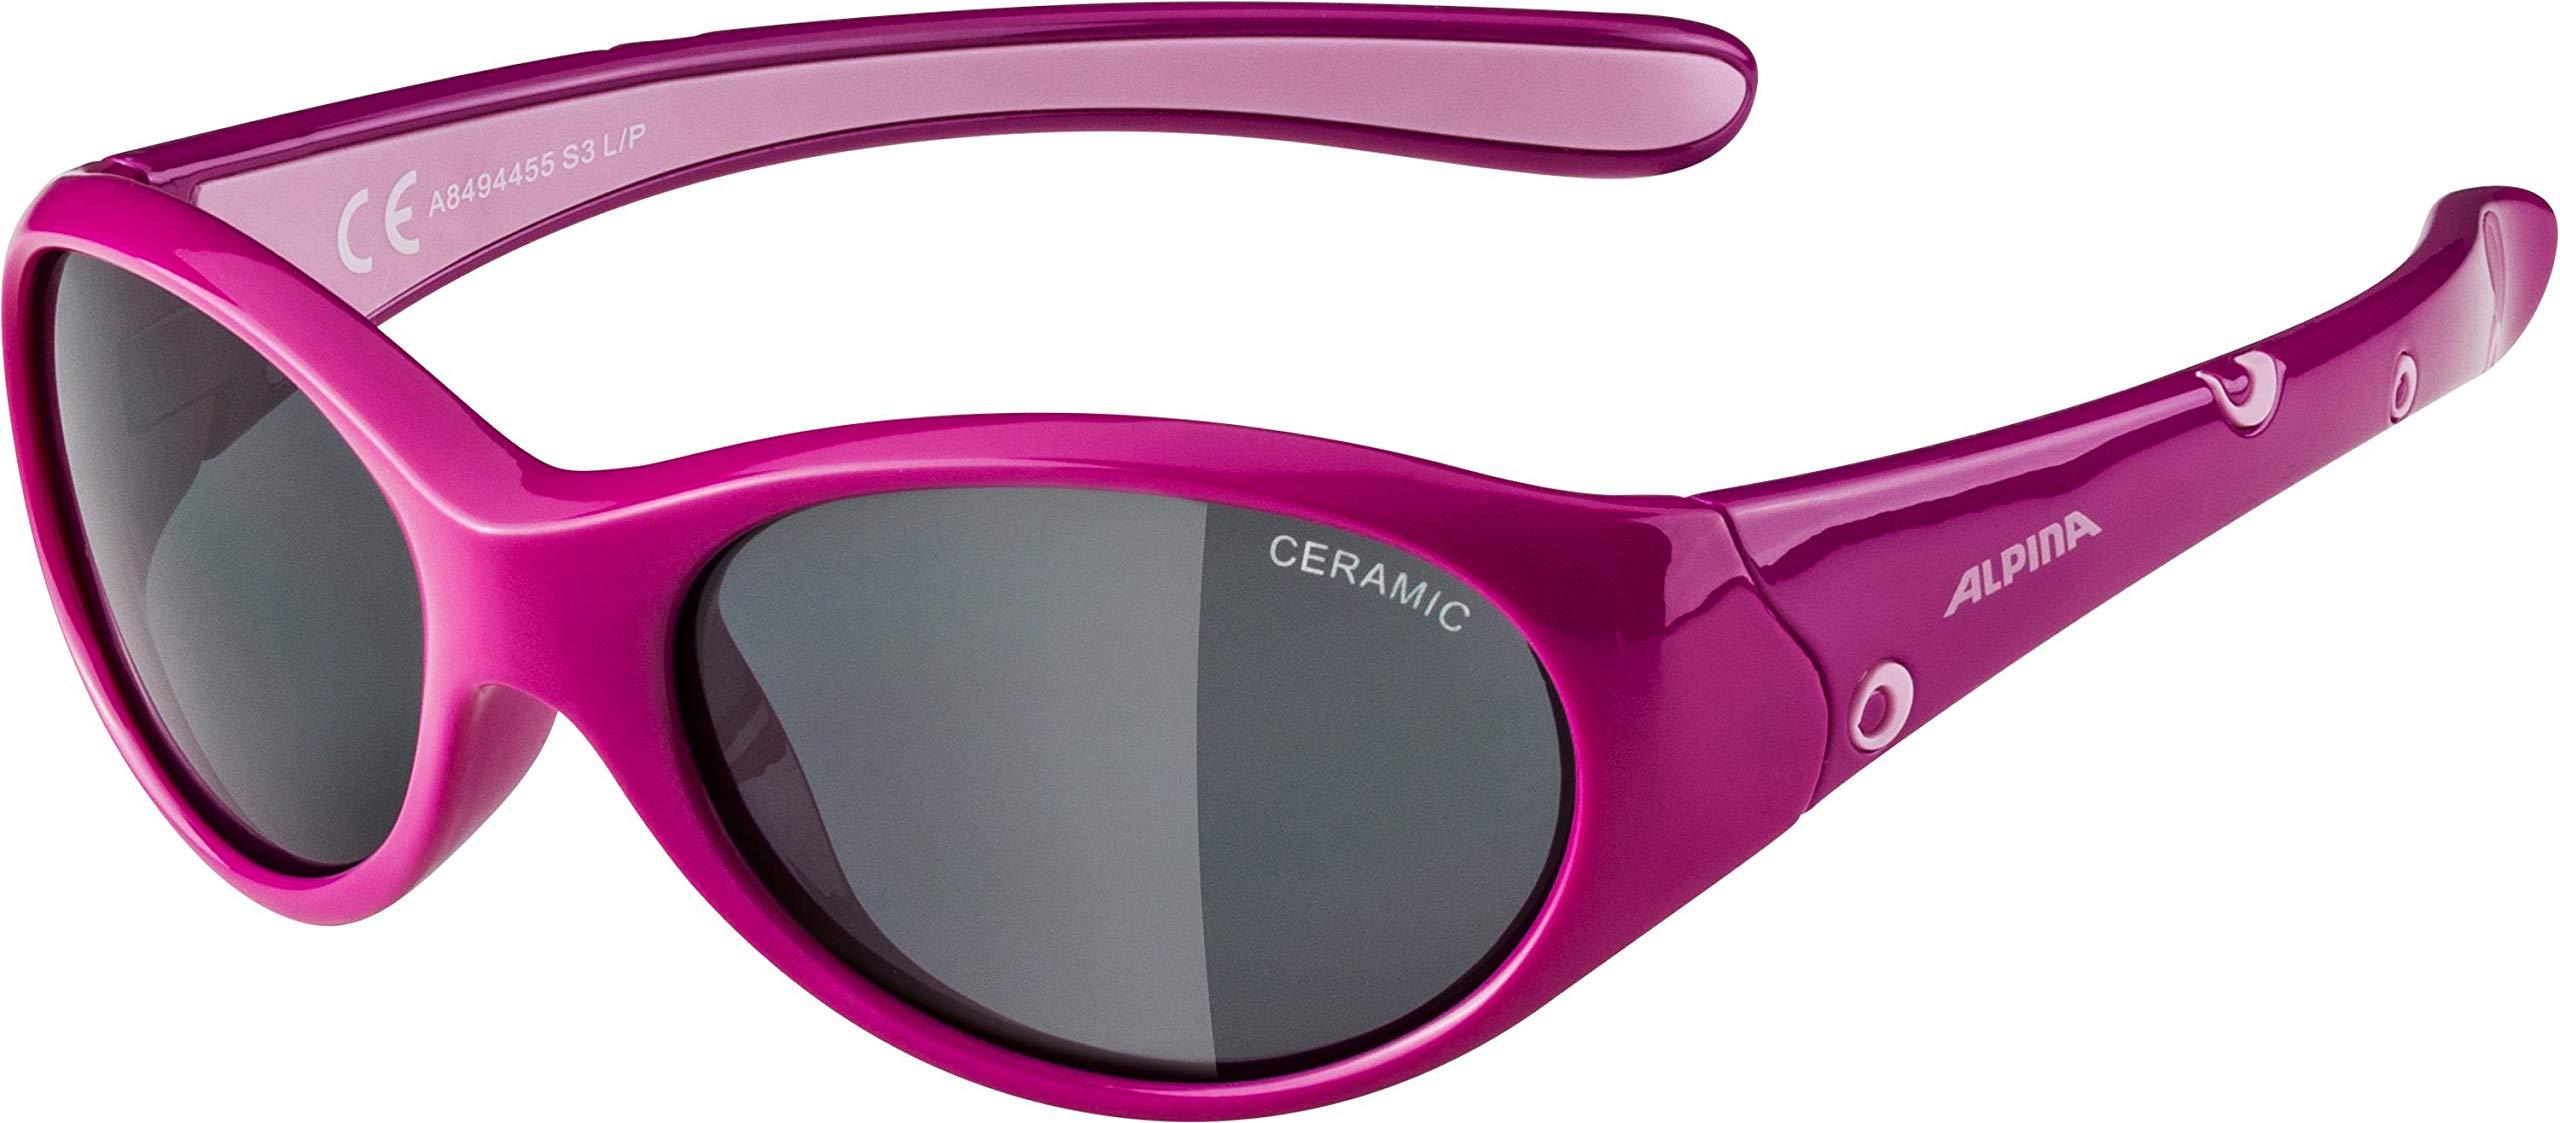 c69c1e15d78f50 Playshoes - 460110 Jungen Schwimmwindel UV-Schutz Windelhose Maritim ·  Alpina Girls Sunglasses Line Flexxy